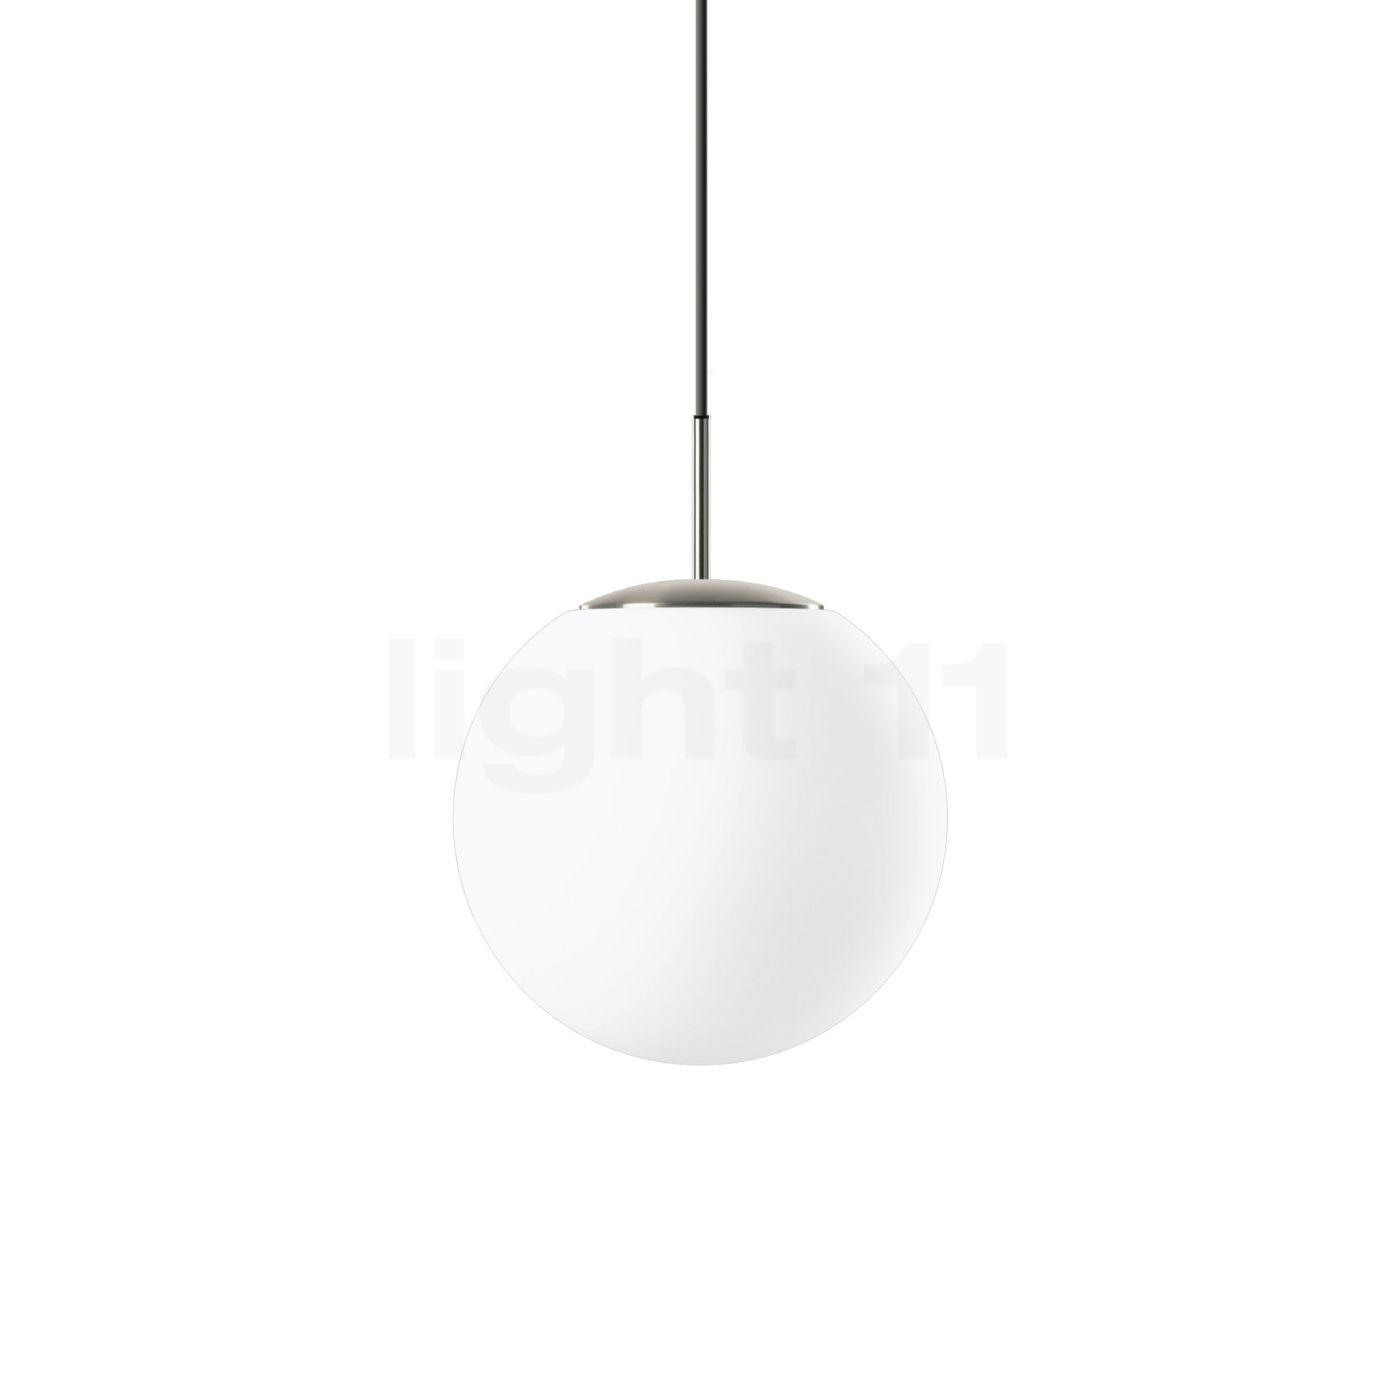 Bega 56590 - Pendelleuchte LED, Edelstahl 56590.2K3